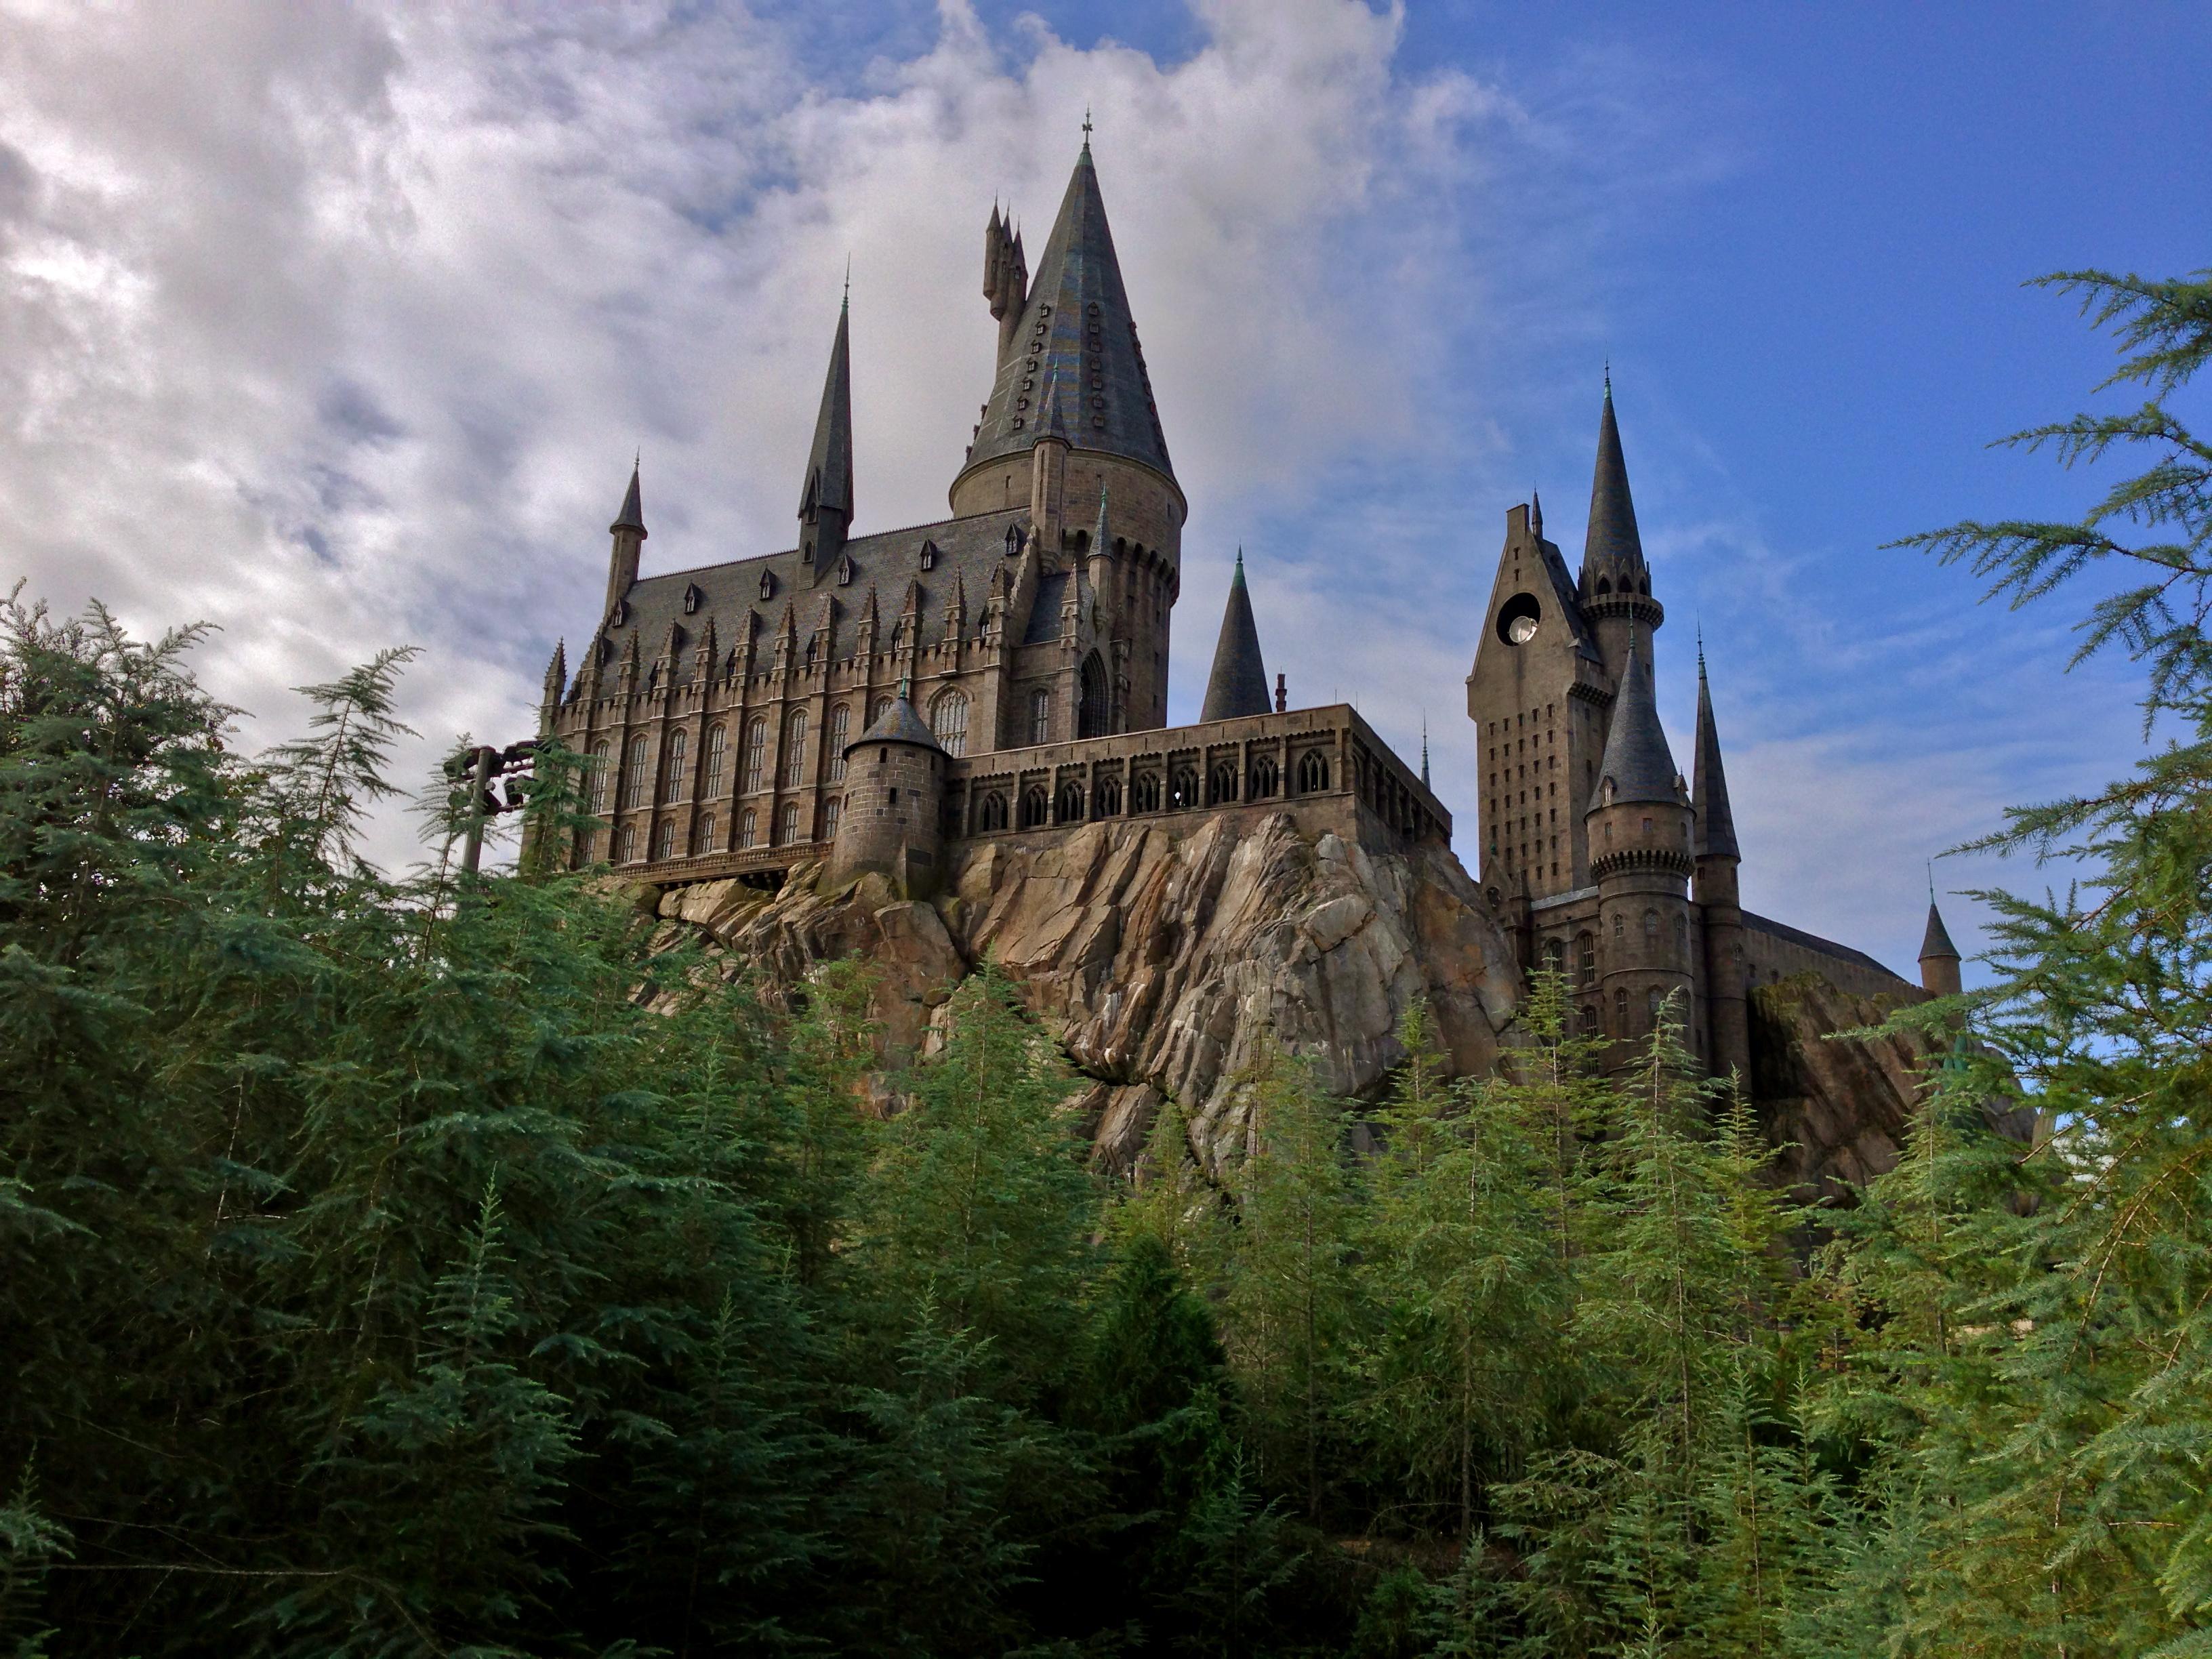 The Wizarding World of Harry Potter Orlando